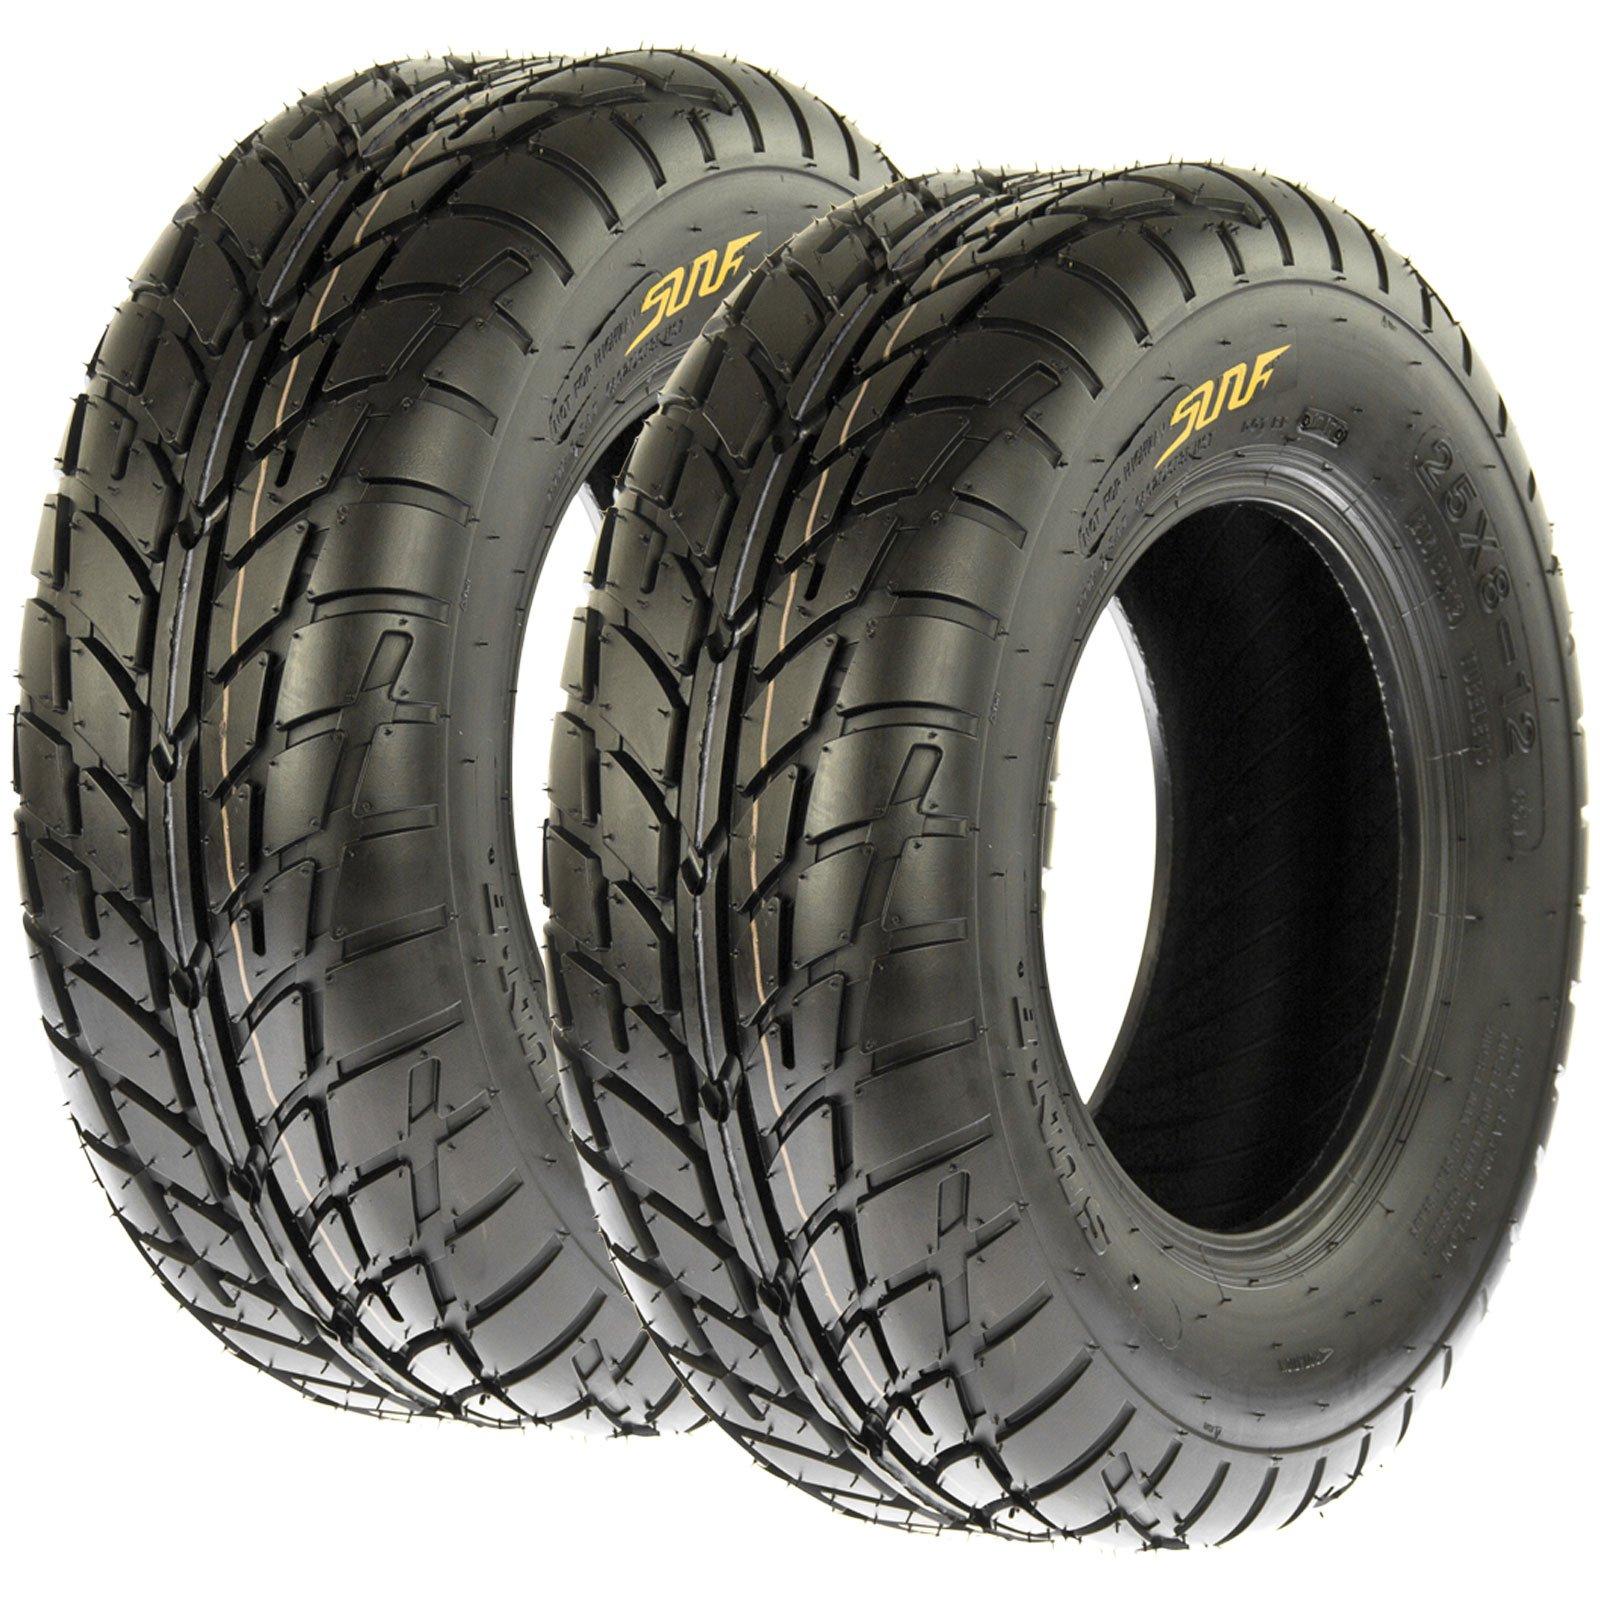 Pair of 2 SunF A021 TT Sport ATV UTV Dirt & Flat Track Tires 22x7-10, 6 PR, Tubeless